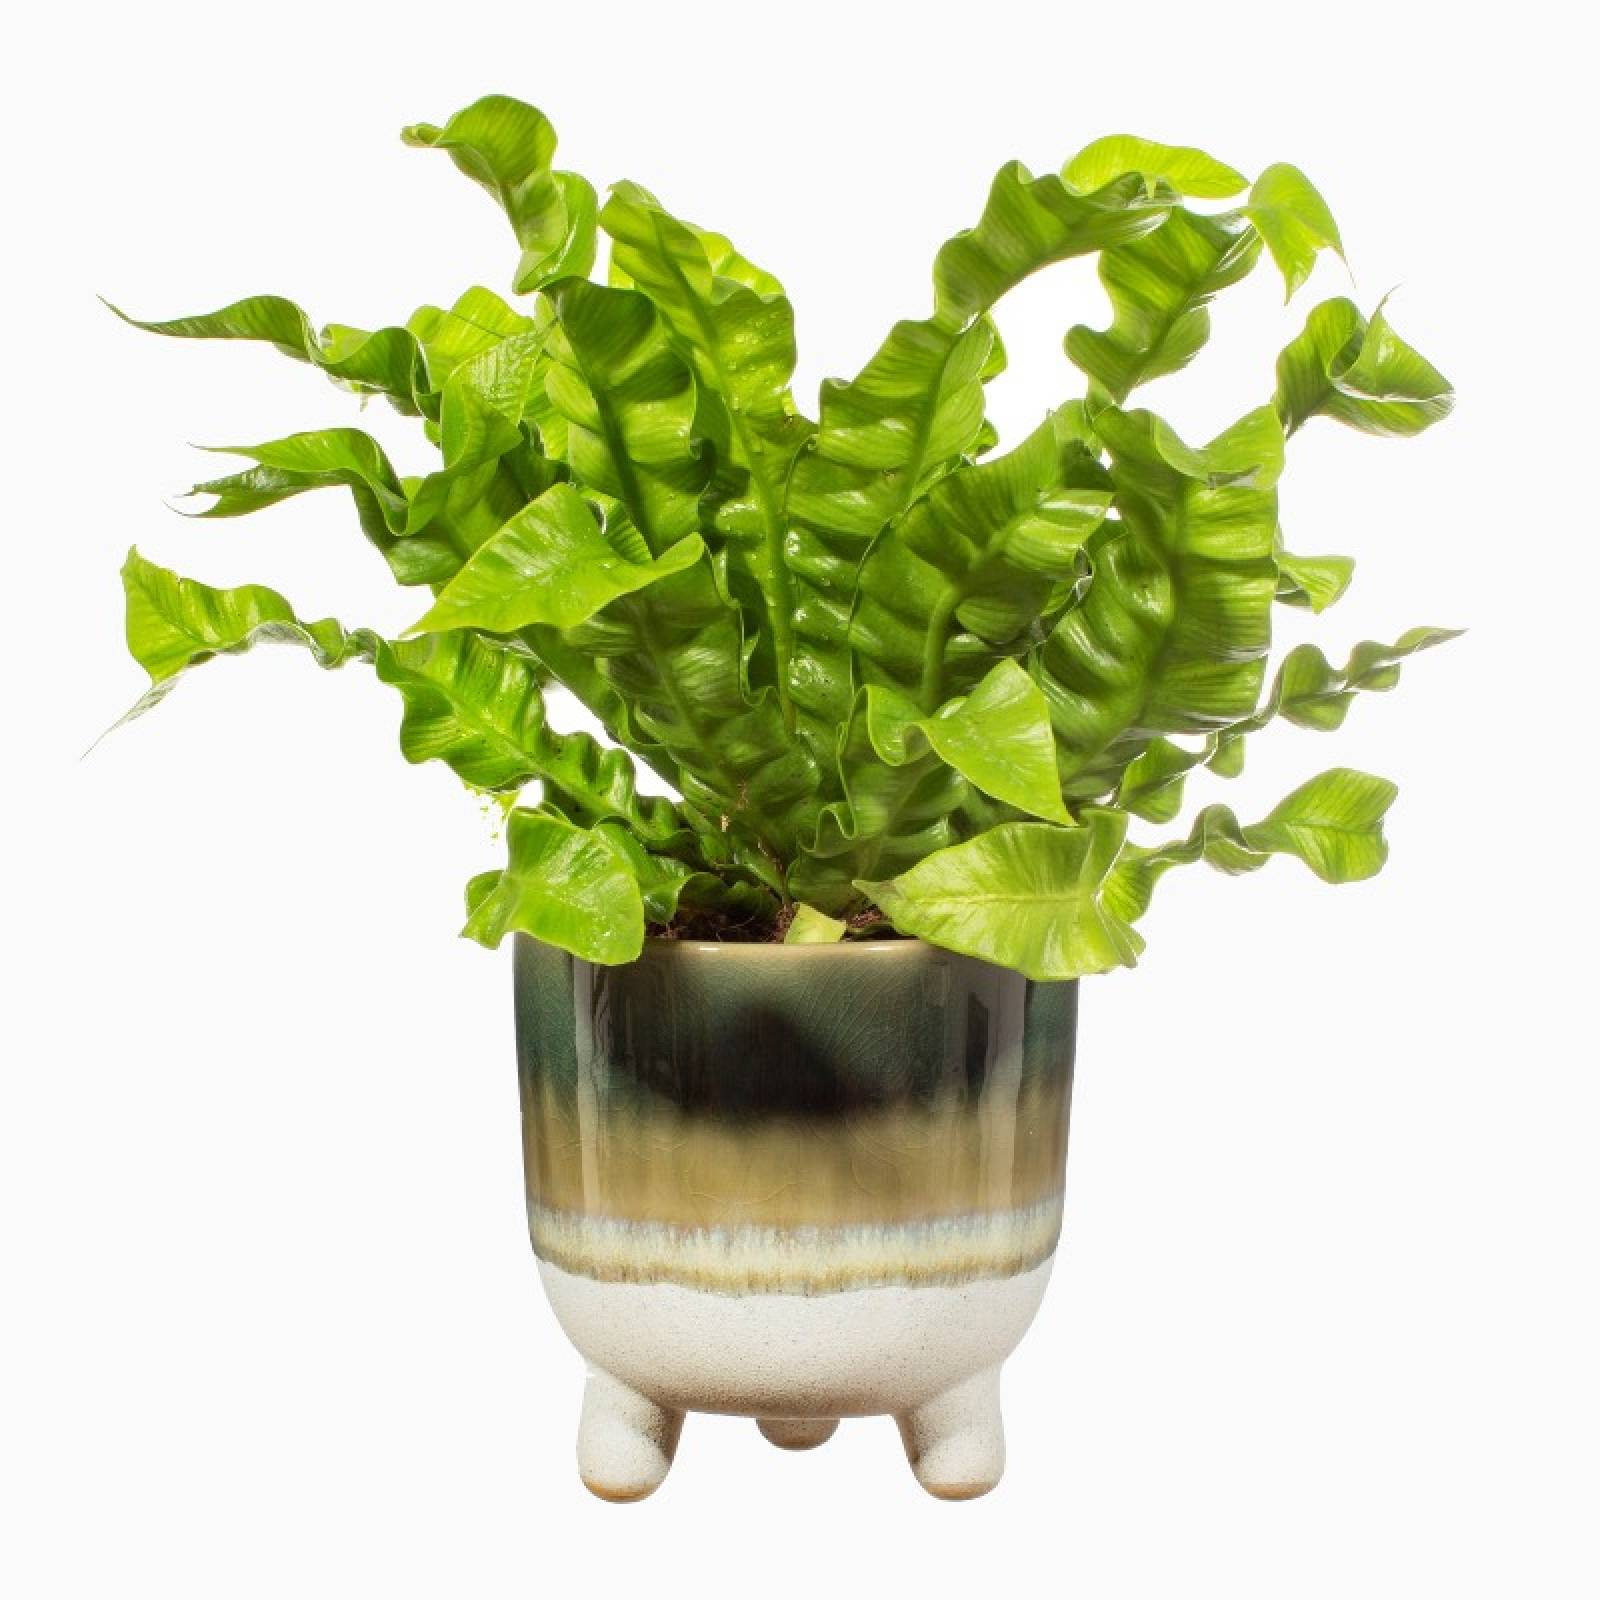 Two Tone Dip Glazed Stoneware Plant Pot In Green